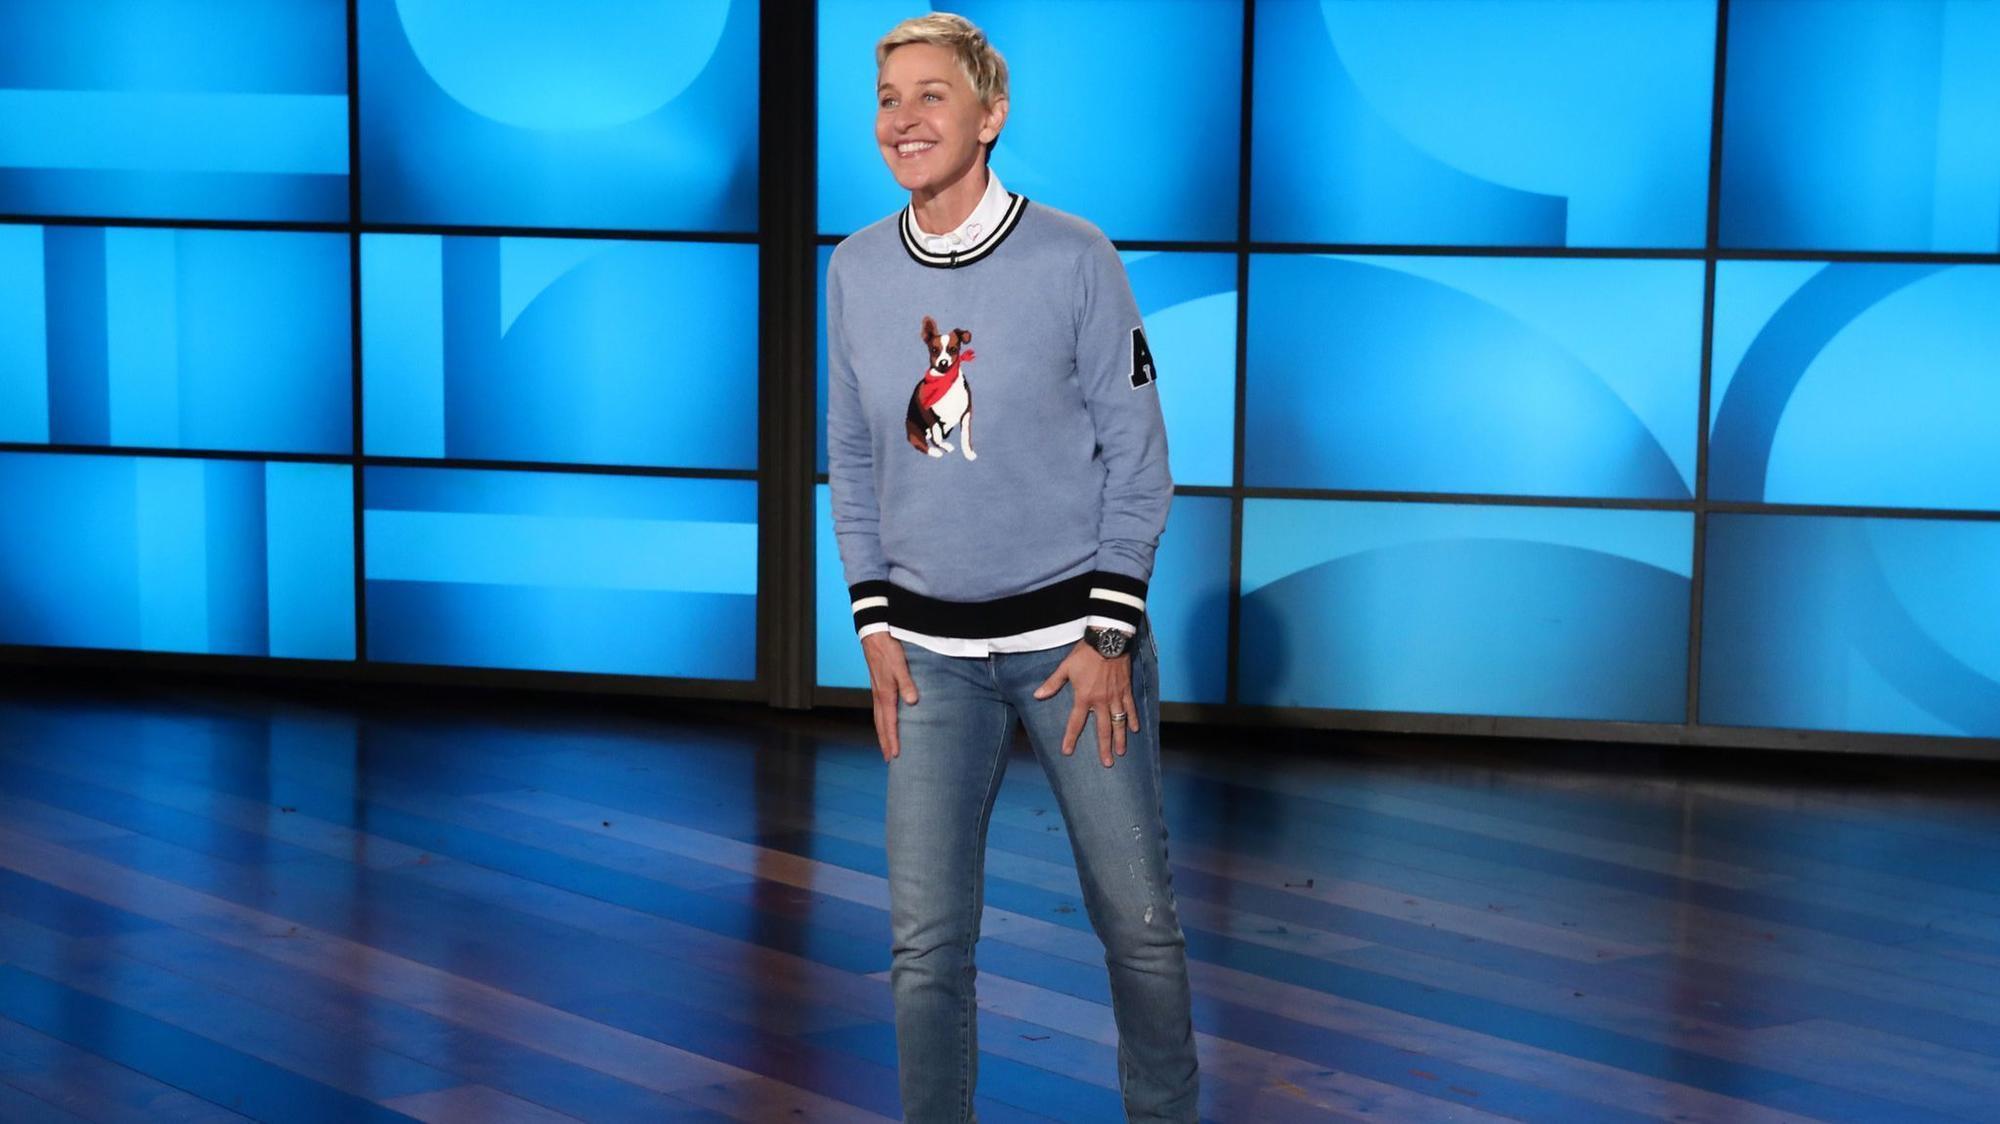 Ellen DeGeneres has 20 million reasons to celebrate her ...